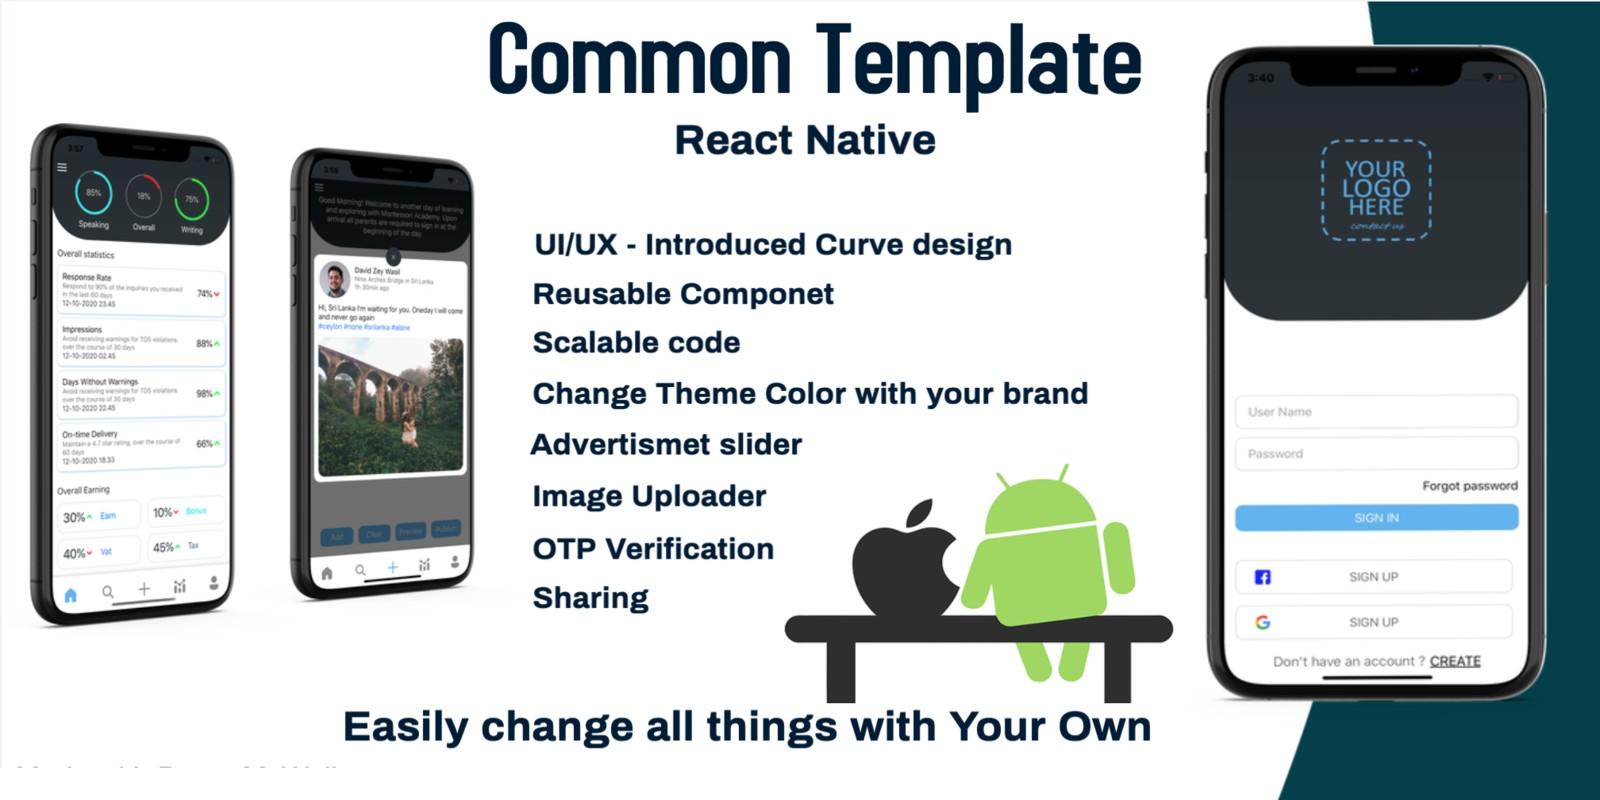 Common Template - React Native